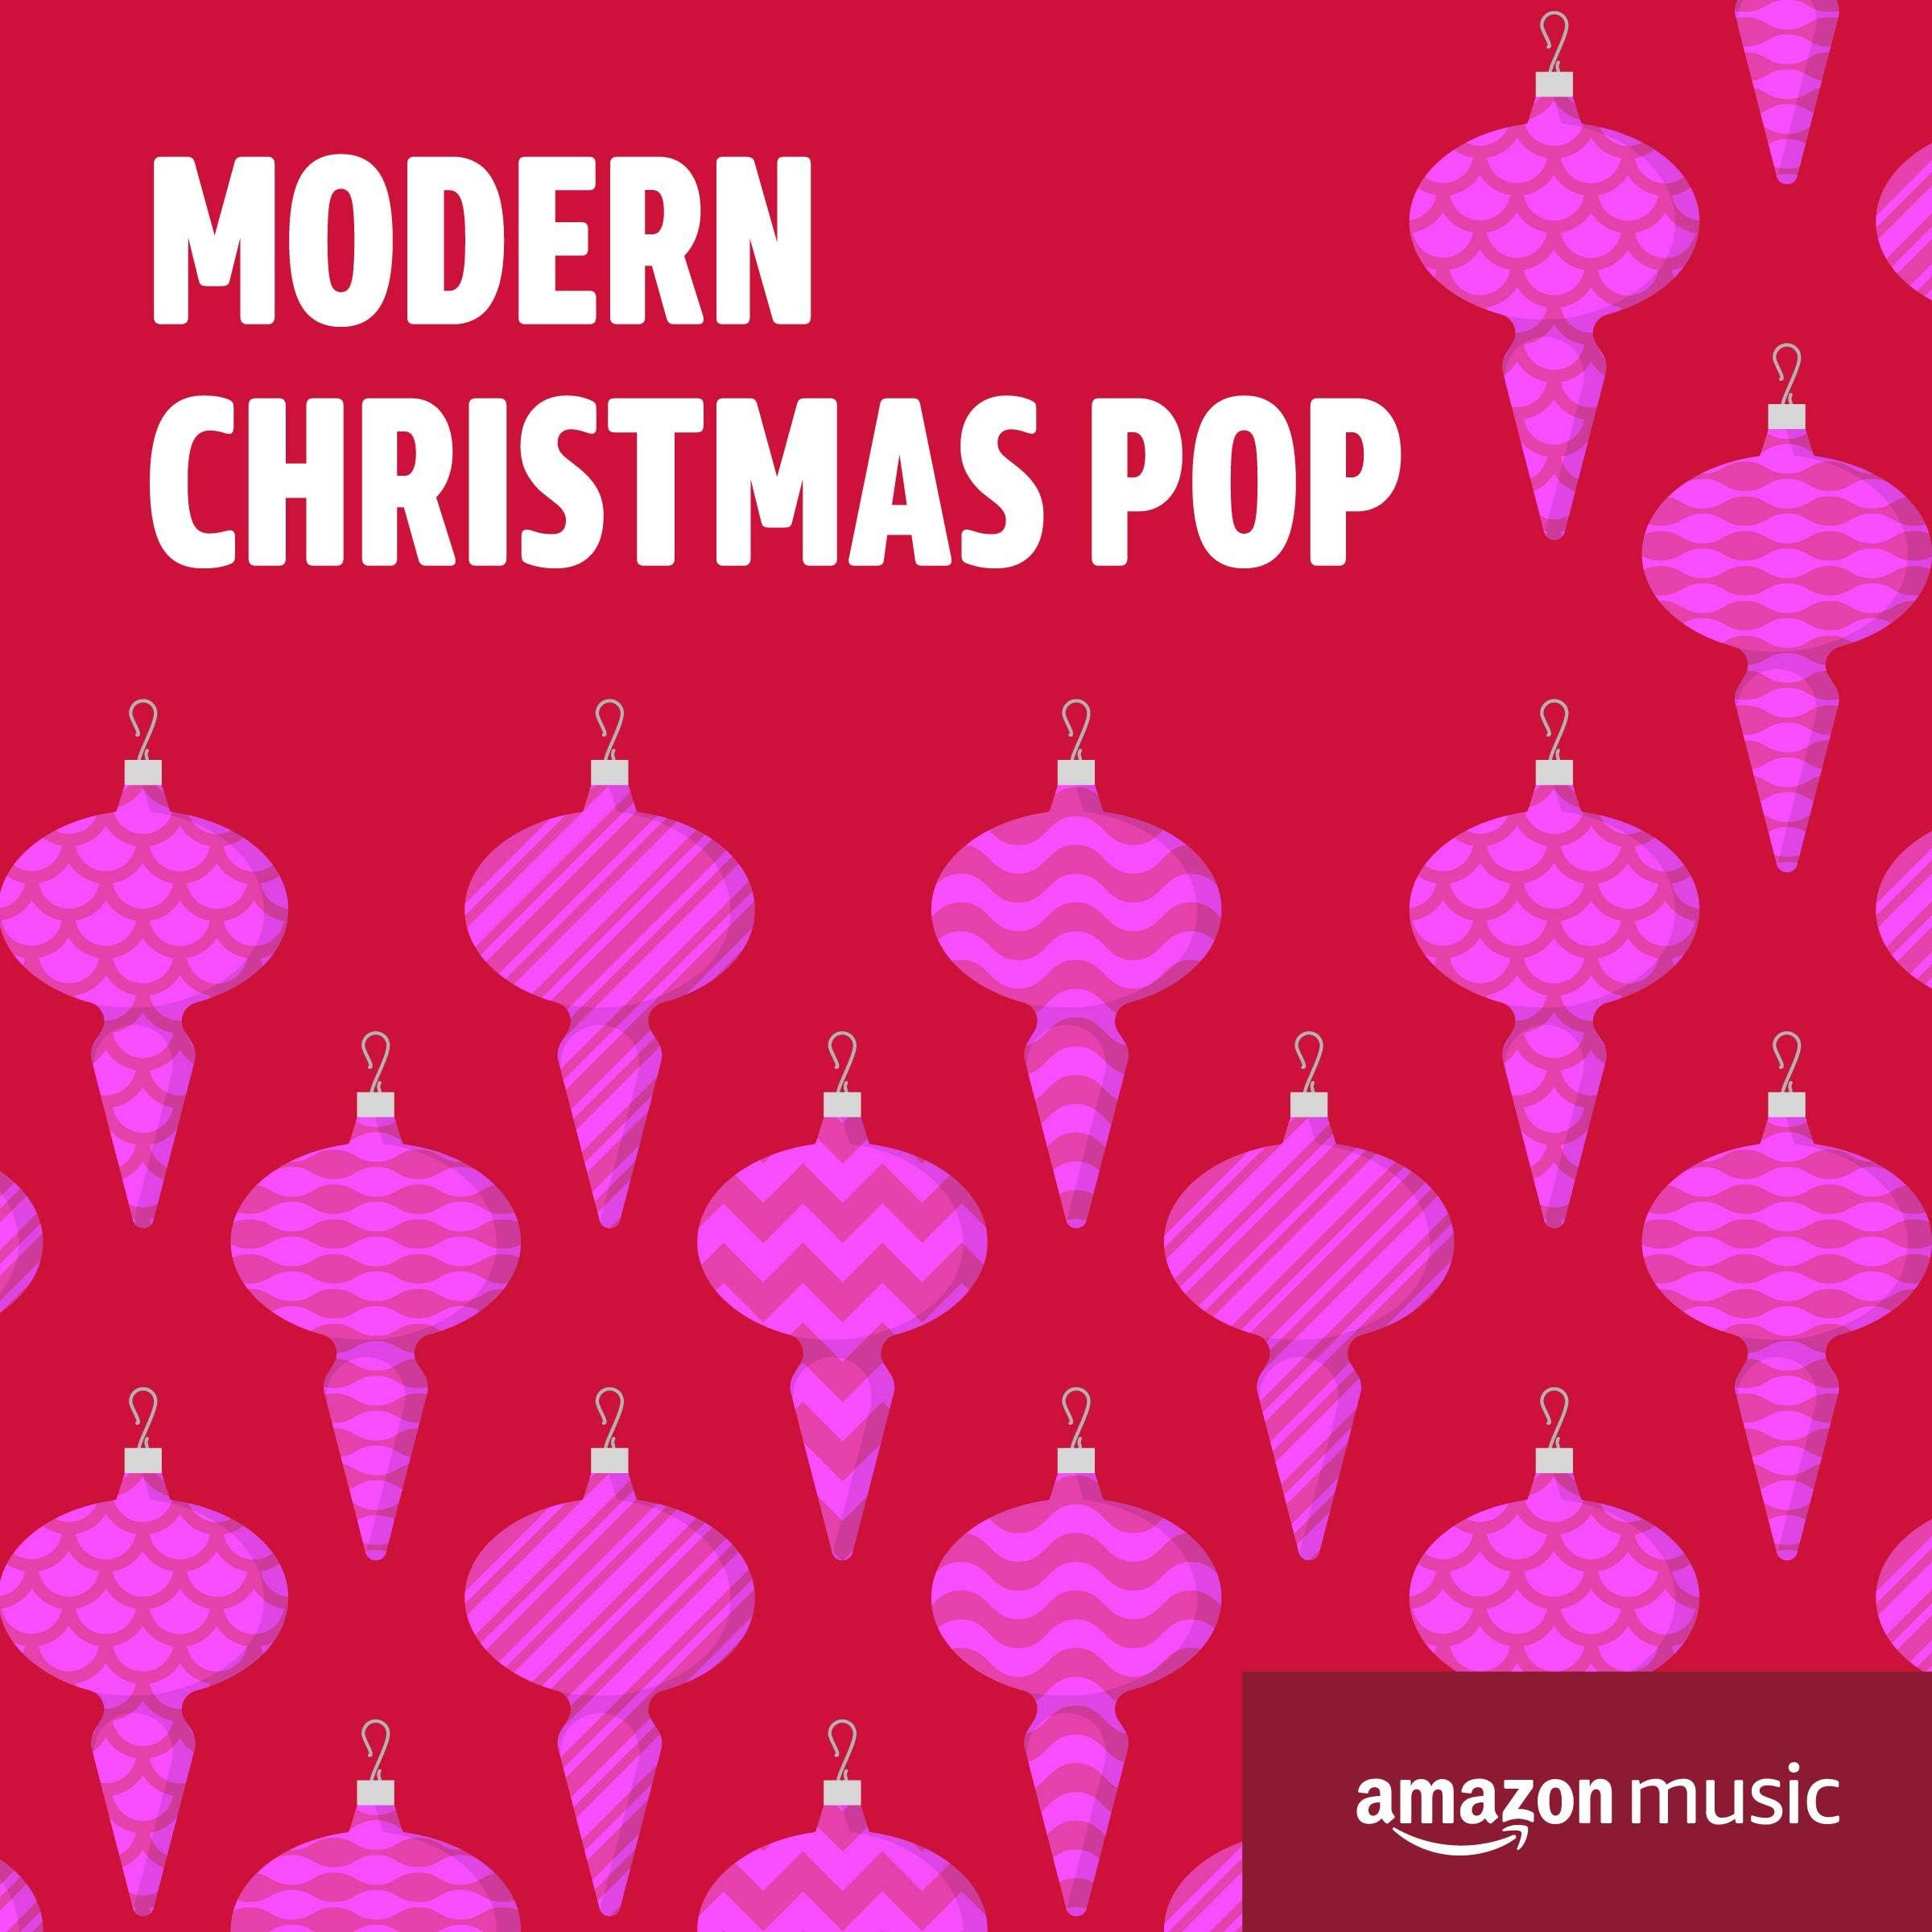 Modern Christmas Pop